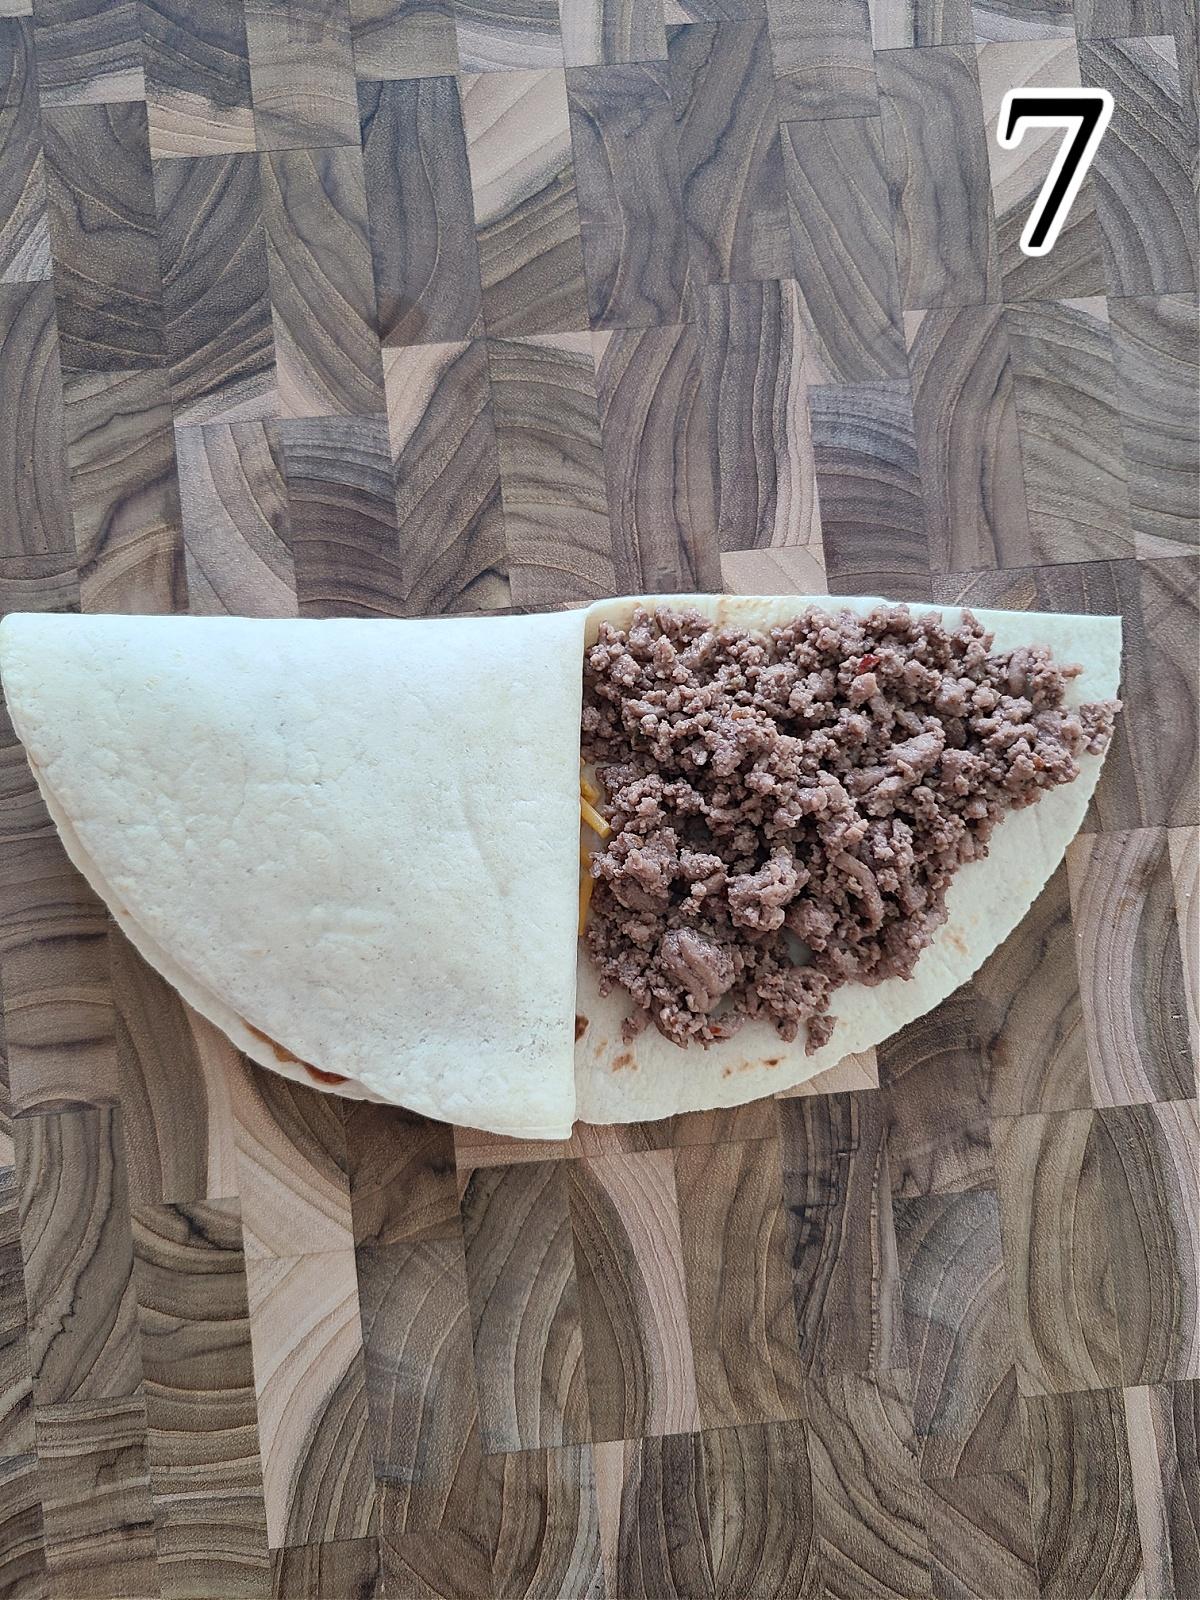 Step by Step TikTok Tortilla Wrap Instructions